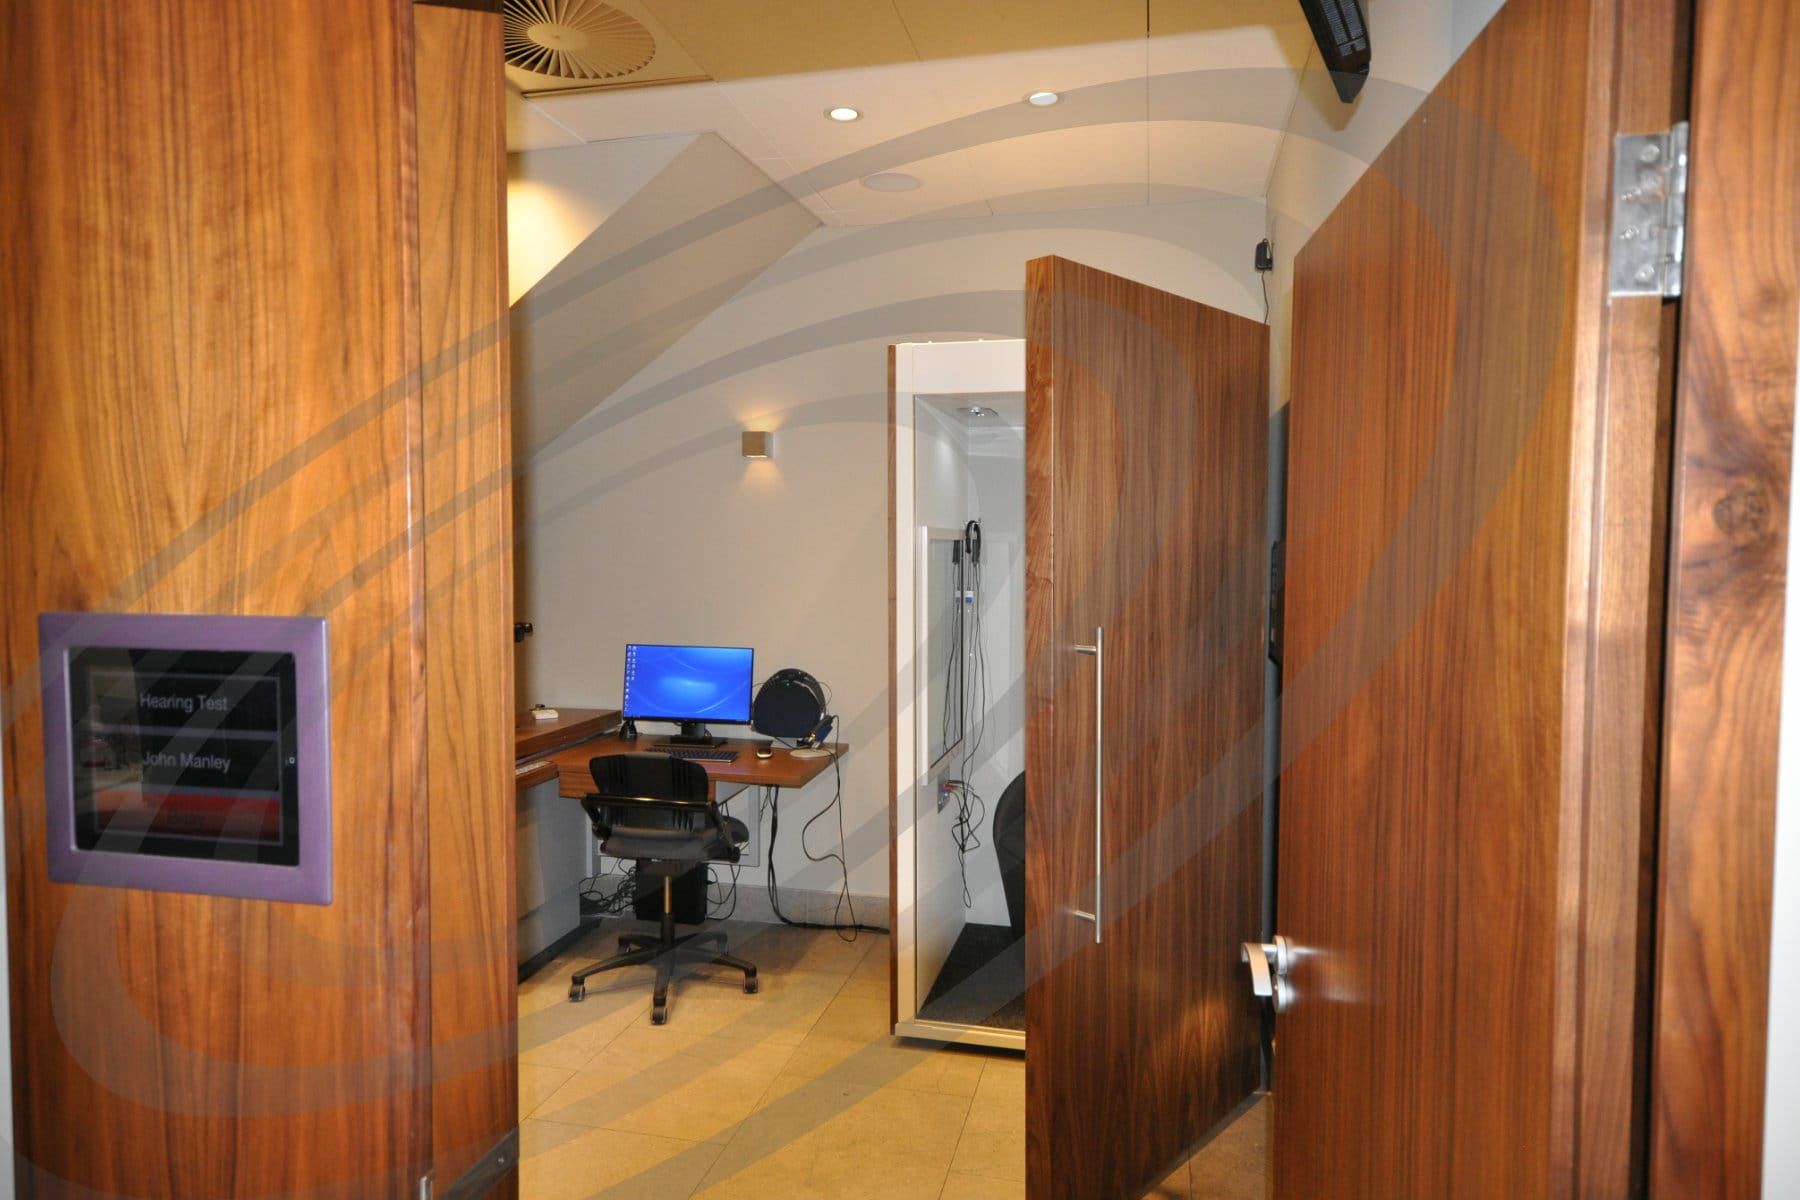 350 sound shelter